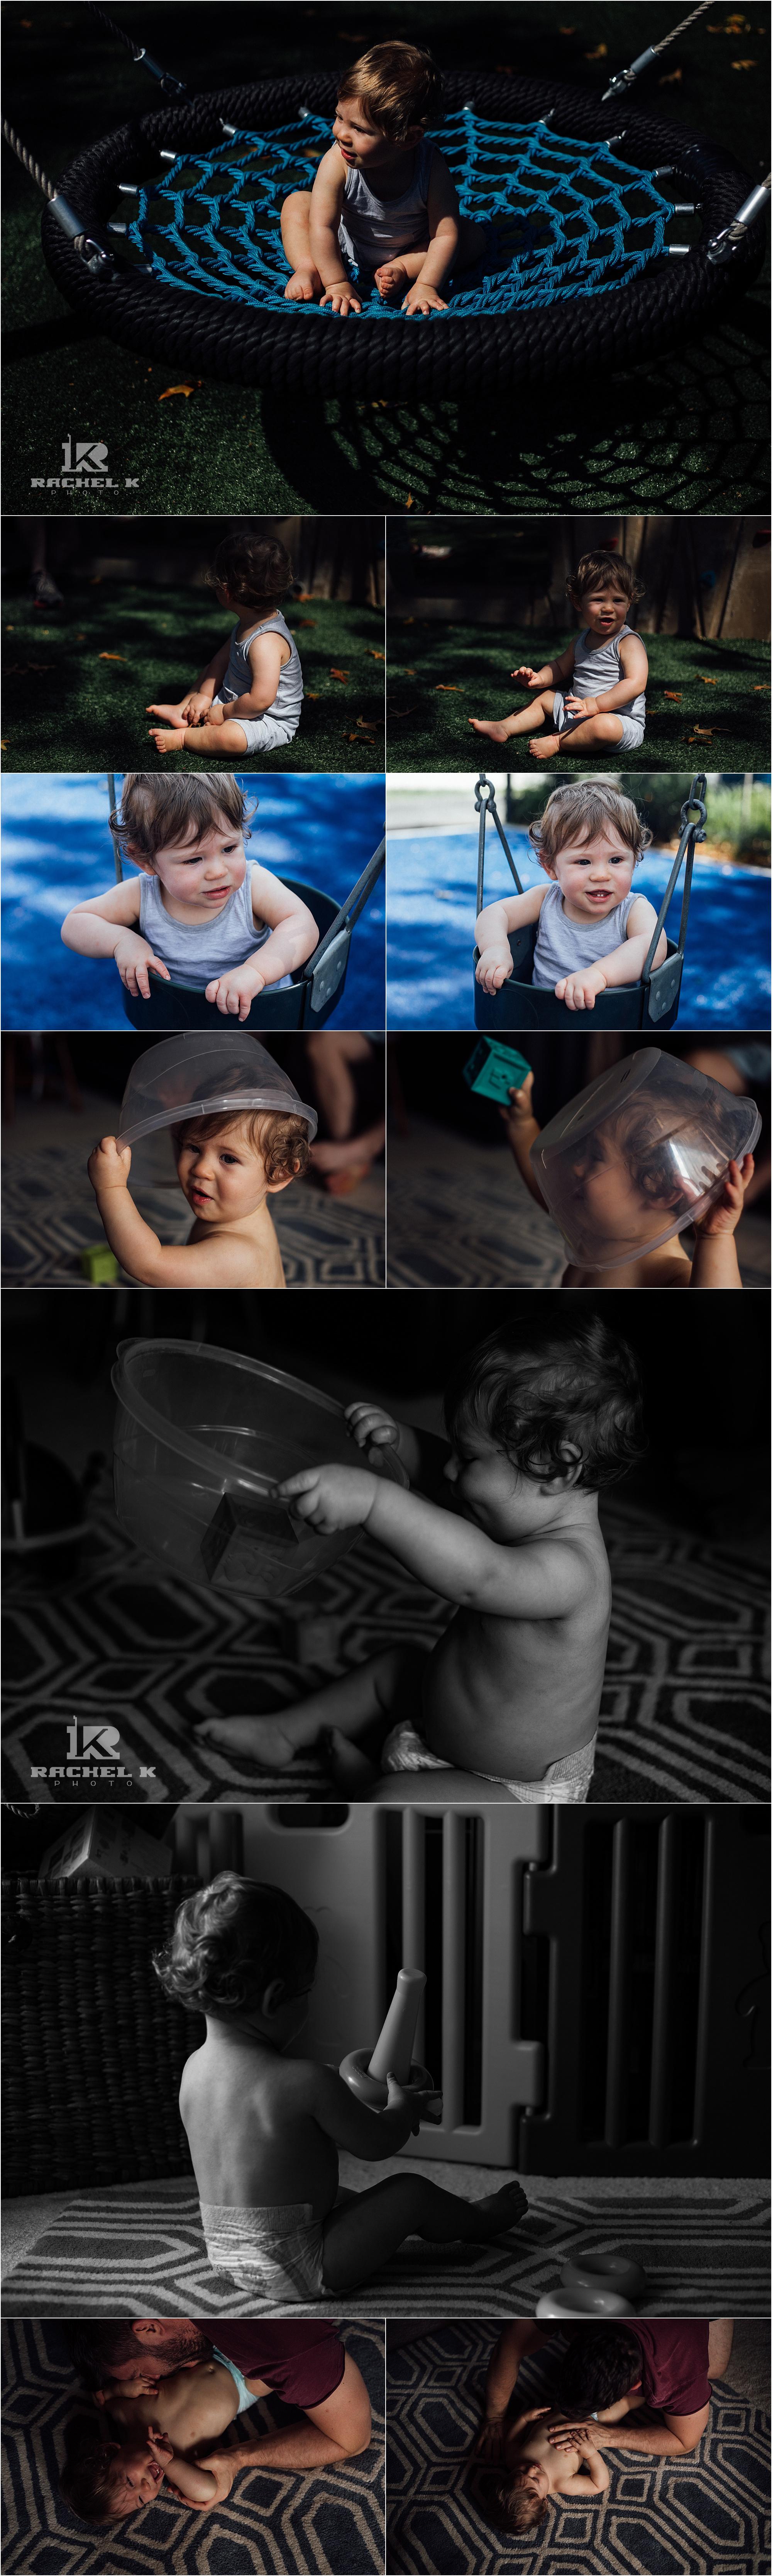 Personal photos for September by Fairfax Virginia family photographer Rachel K Photo